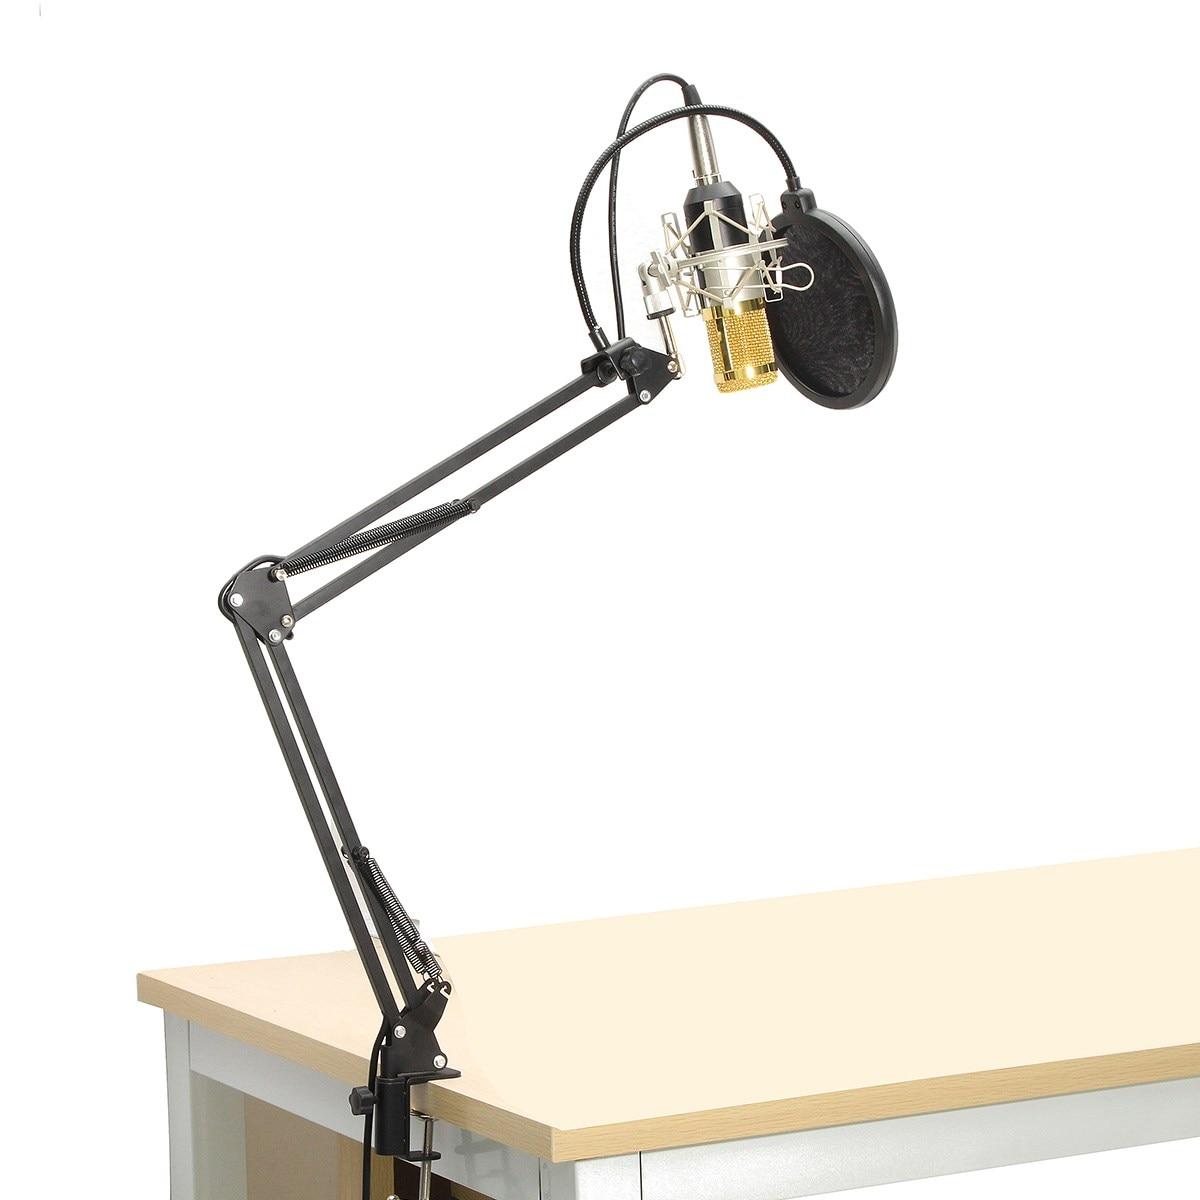 ФОТО BM-800 Condenser Microphone Professional Kit Set Broadcast Studio Recording Mic With Arm Boom Stand +Pop Filter+Sponge Foam